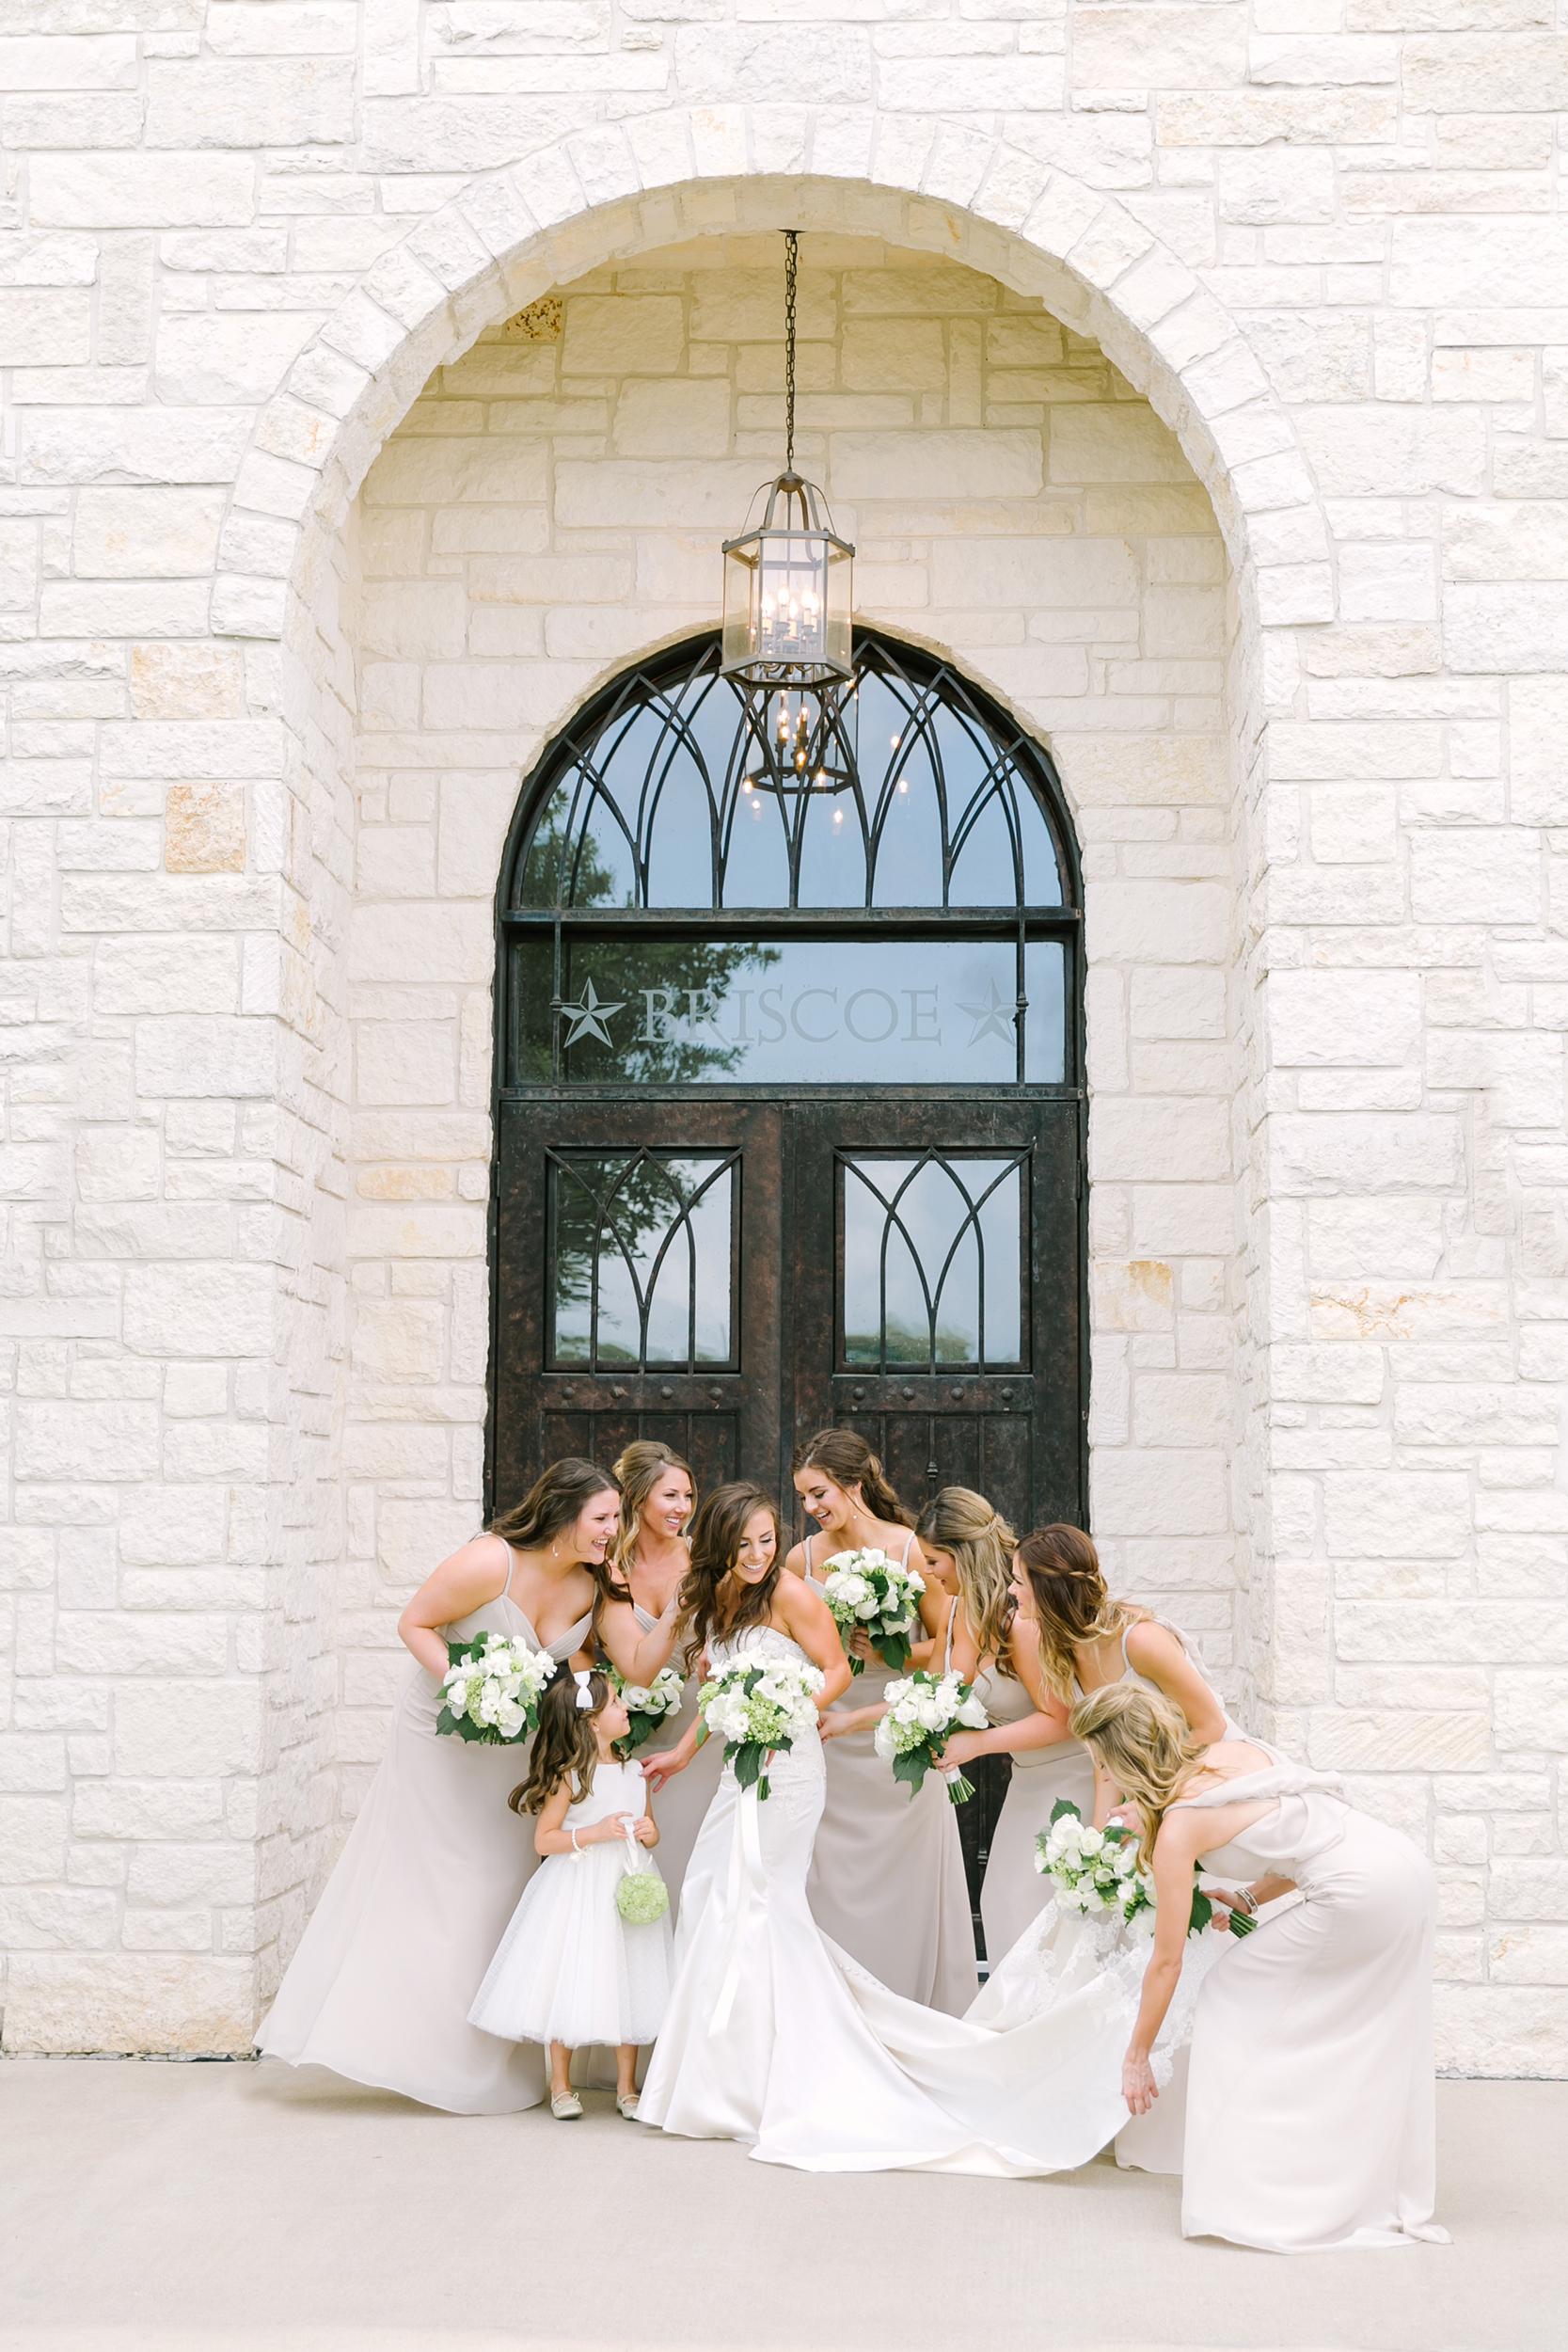 Austin_Wedding_Photographer_Kimberly_Brooke_Photographic_135.jpg